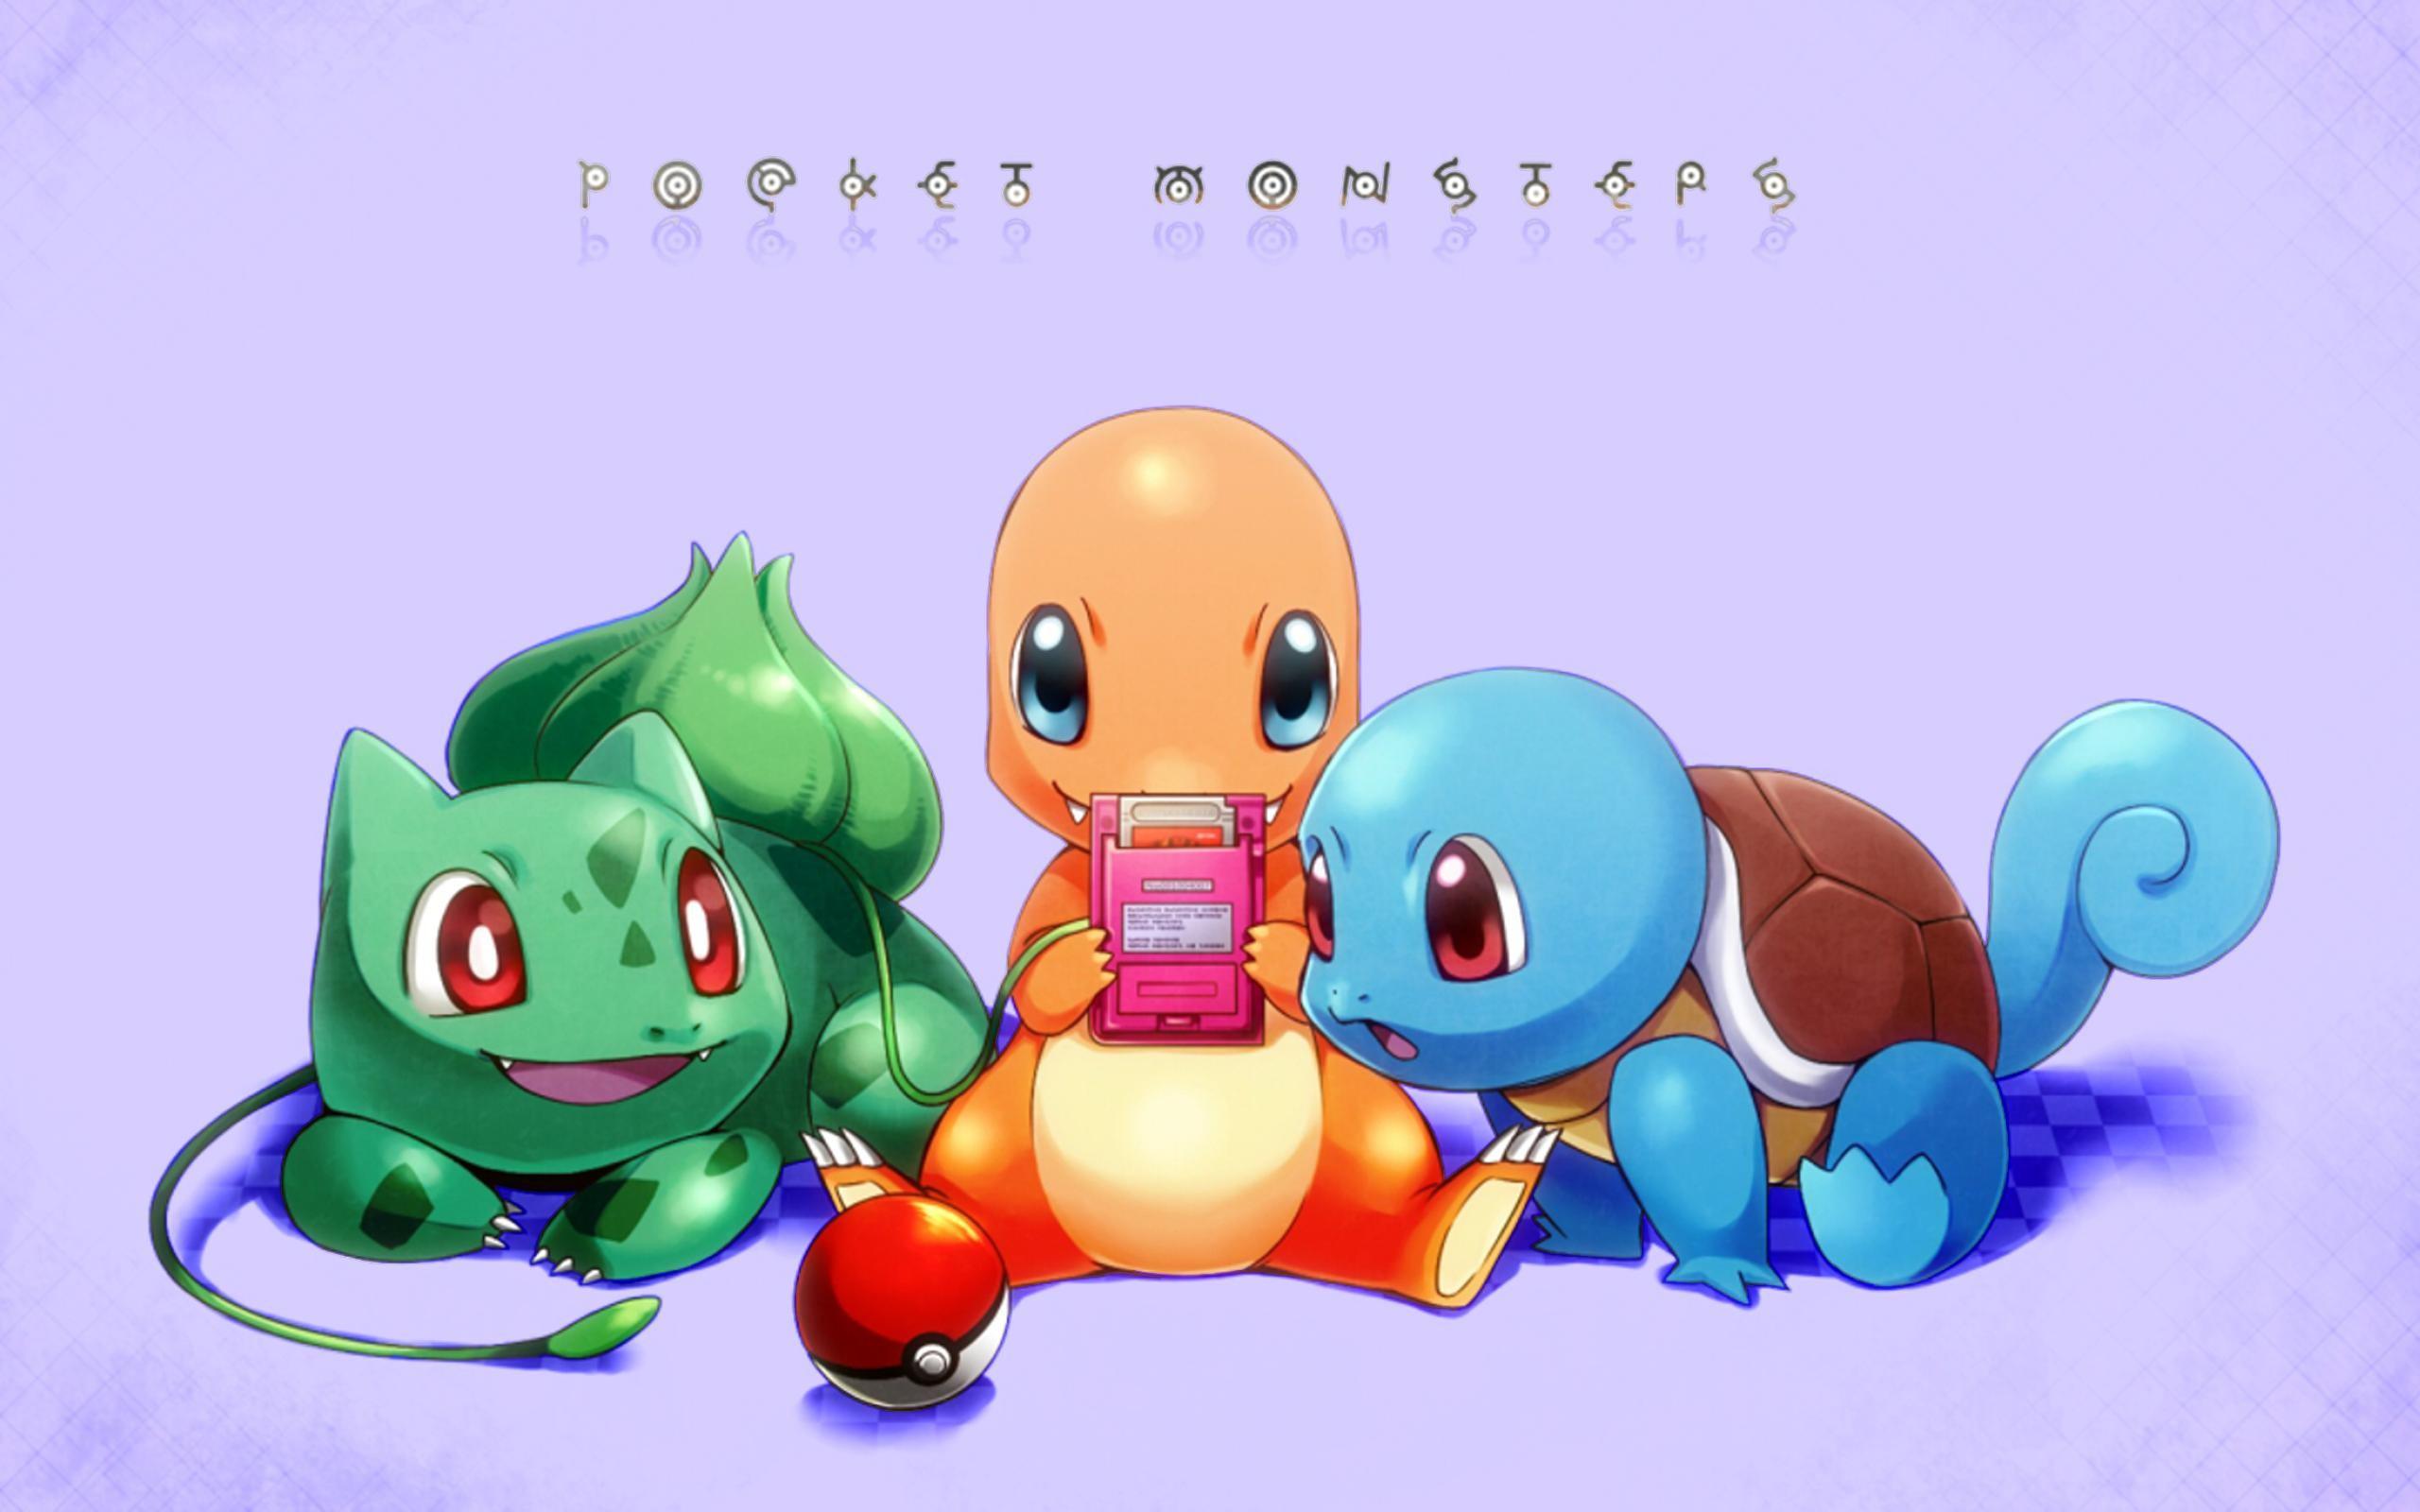 Video Game РPok̩mon Bulbasaur (Pok̩mon) Squirtle (Pok̩mon) Charmander ( Pok̩mon)